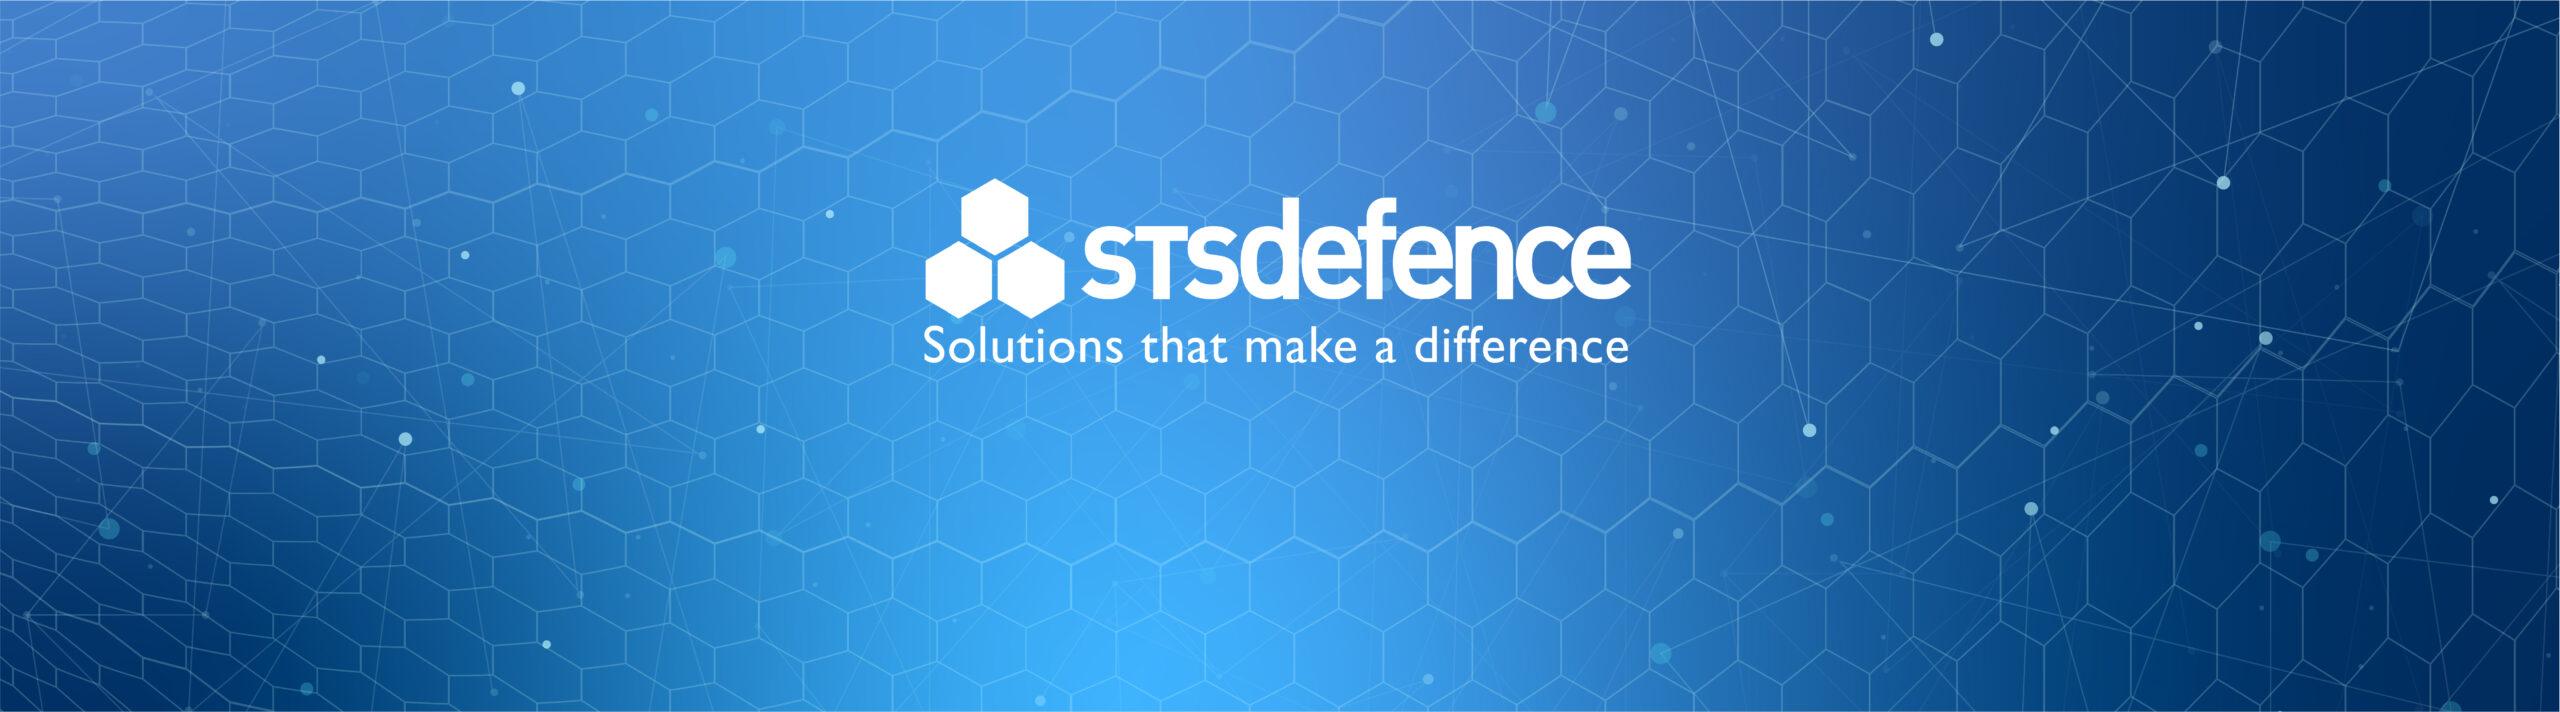 STS Defence Hex grid banner